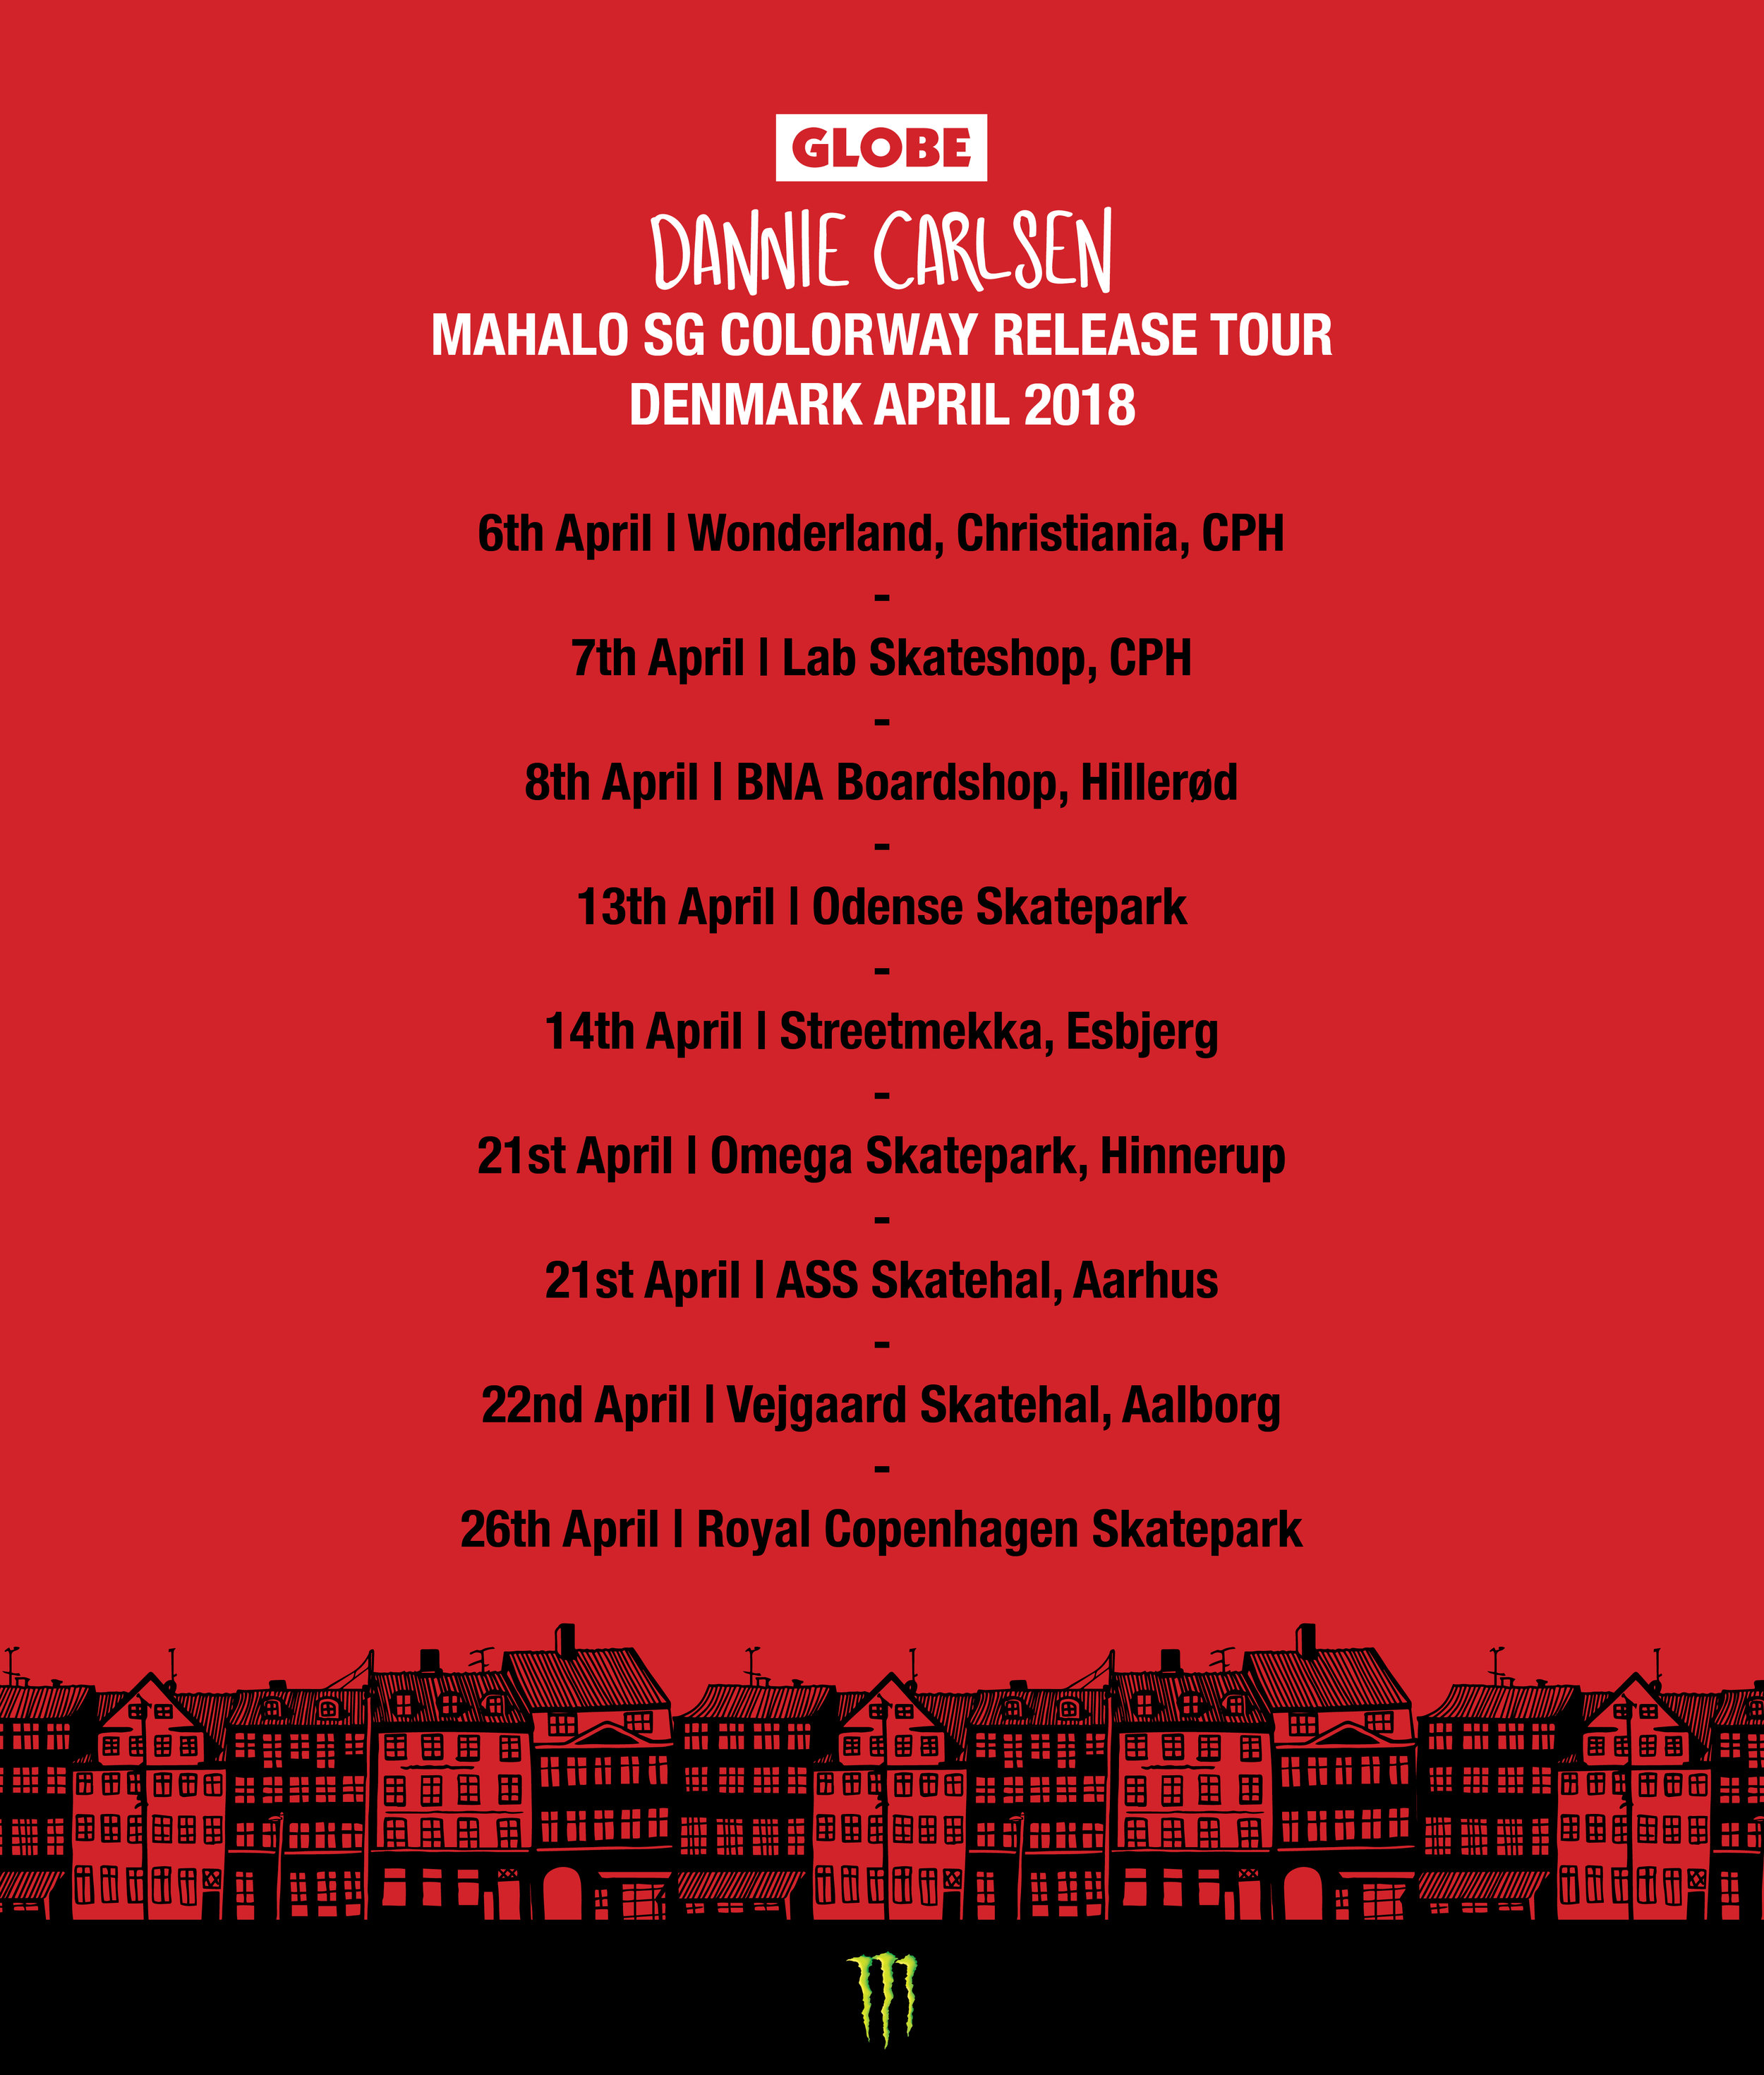 Dannie-tour-IG (2).jpg